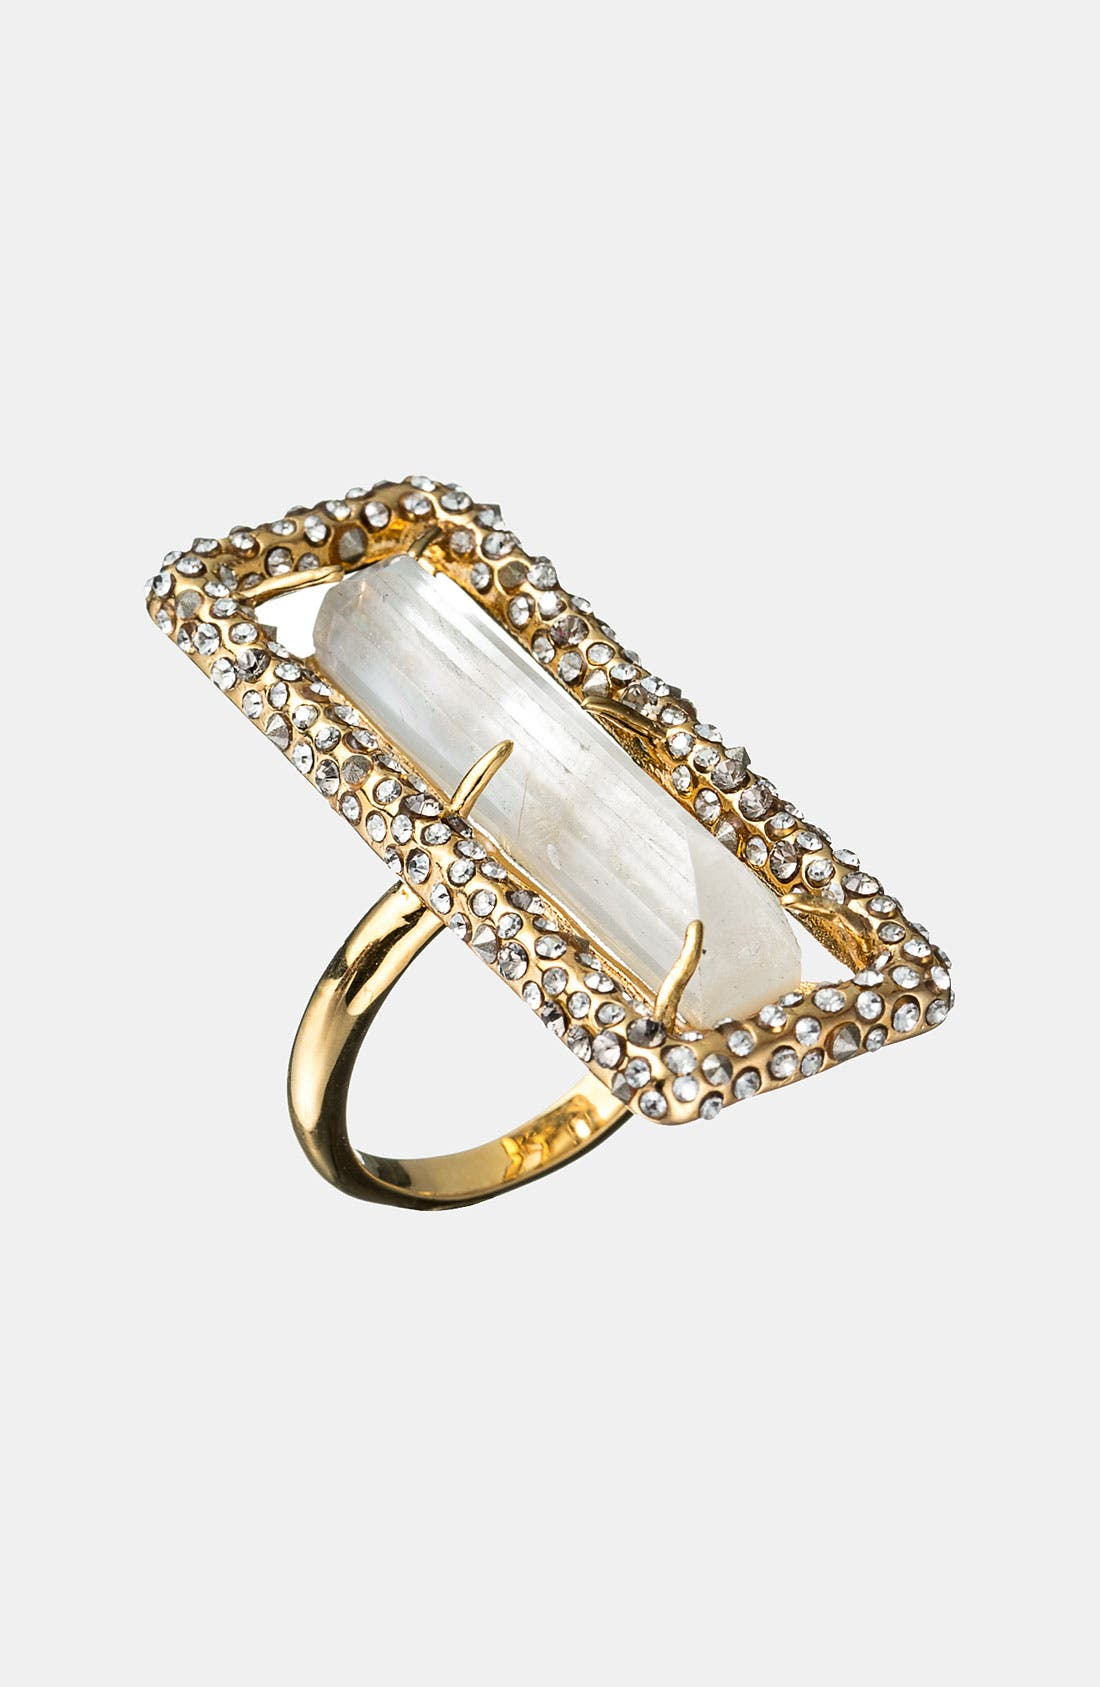 Main Image - Alexis Bittar 'Miss Havisham - Bel Air' Baguette Ring